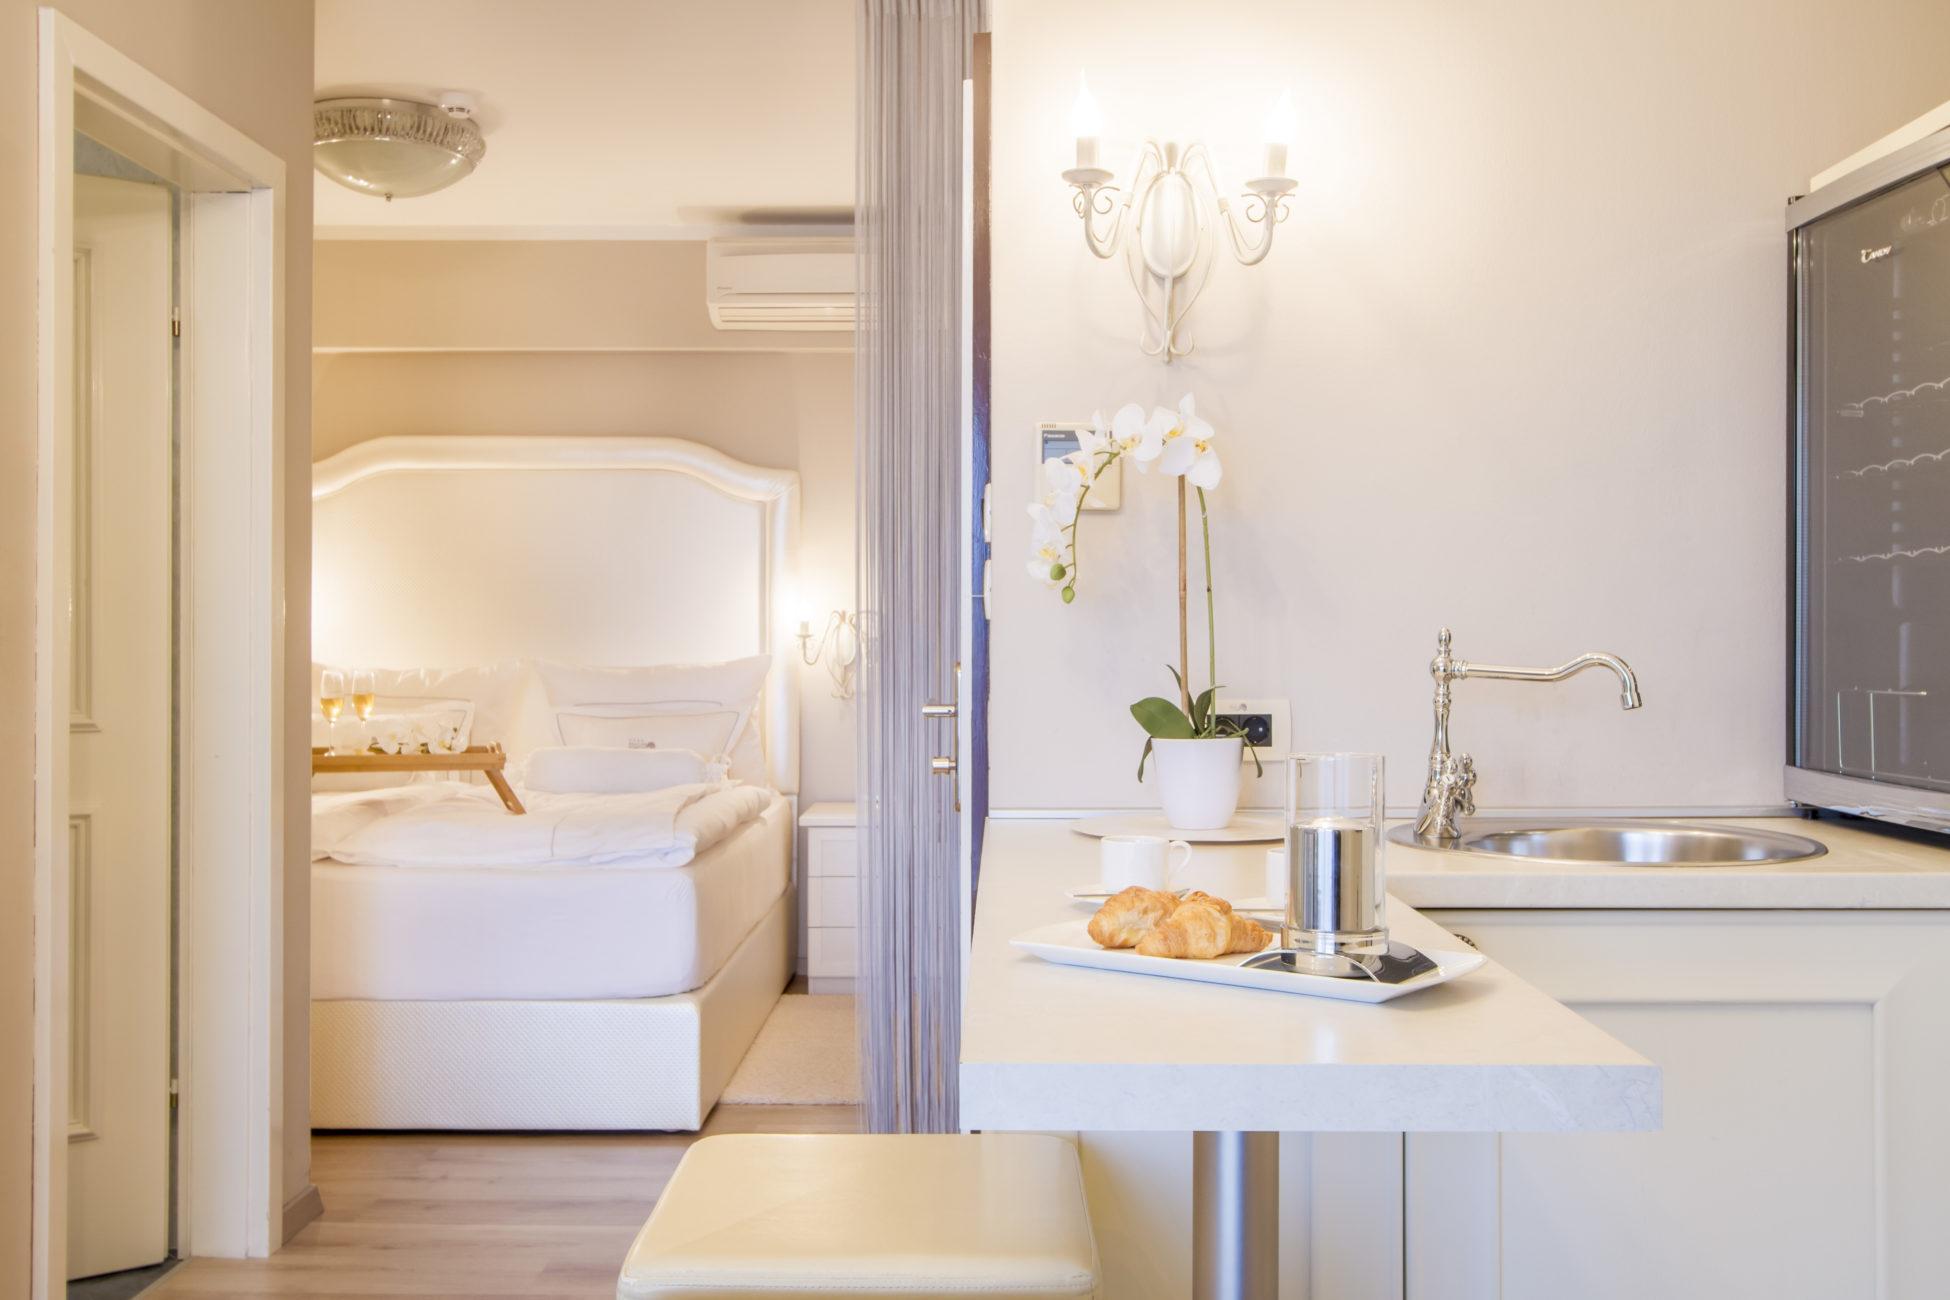 Romantic suite of Hotel Malin